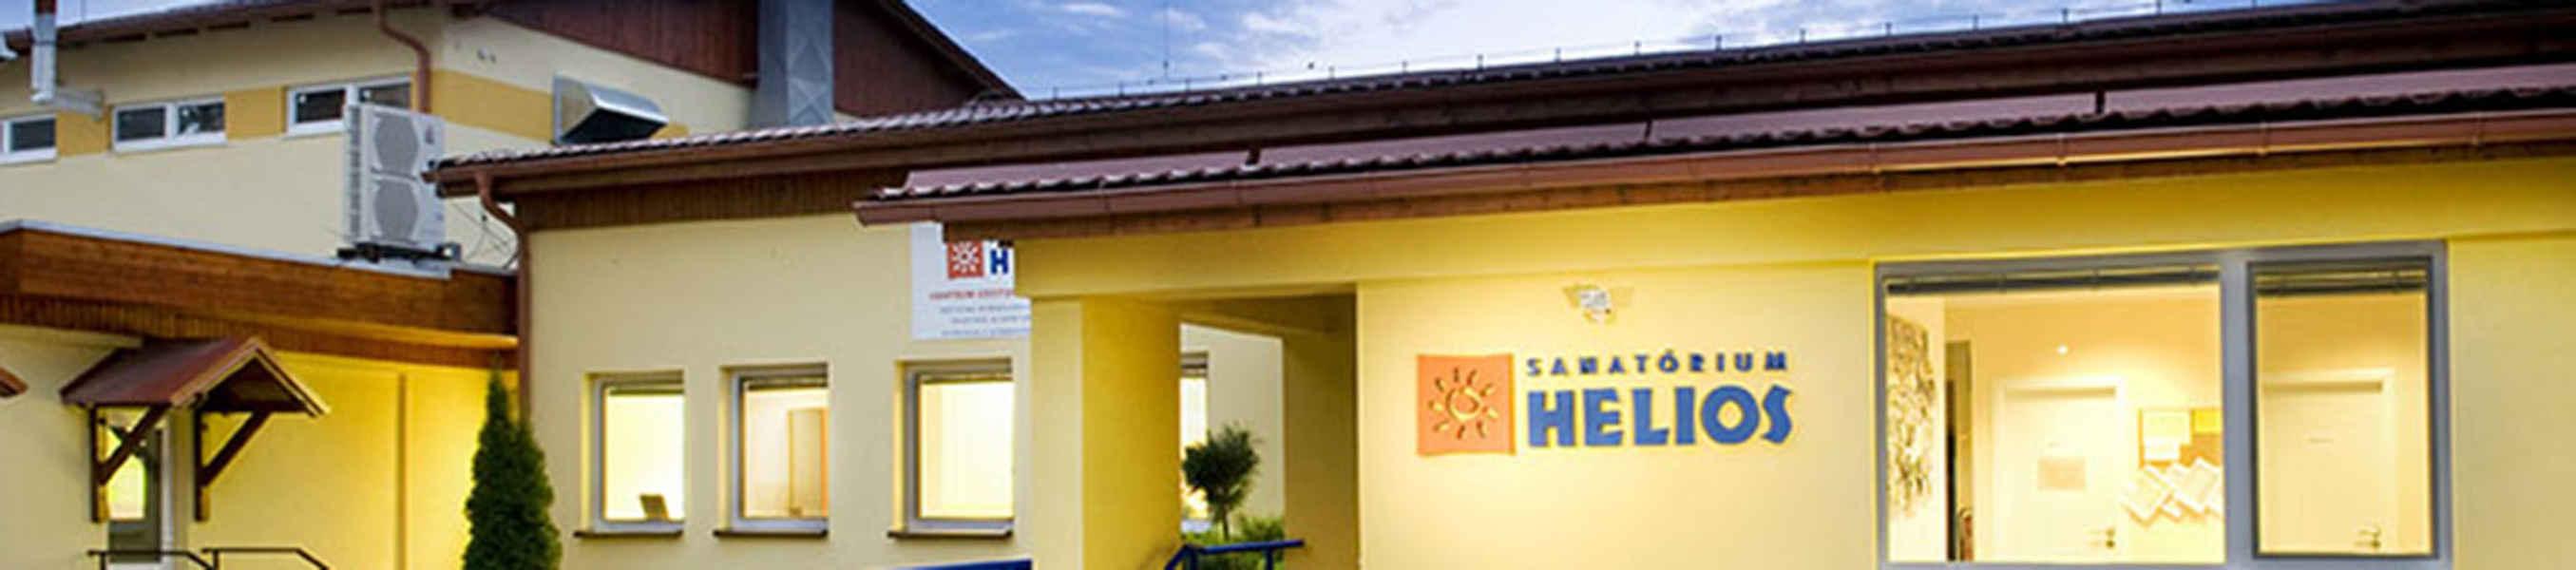 Sanatorium Helios v Martine